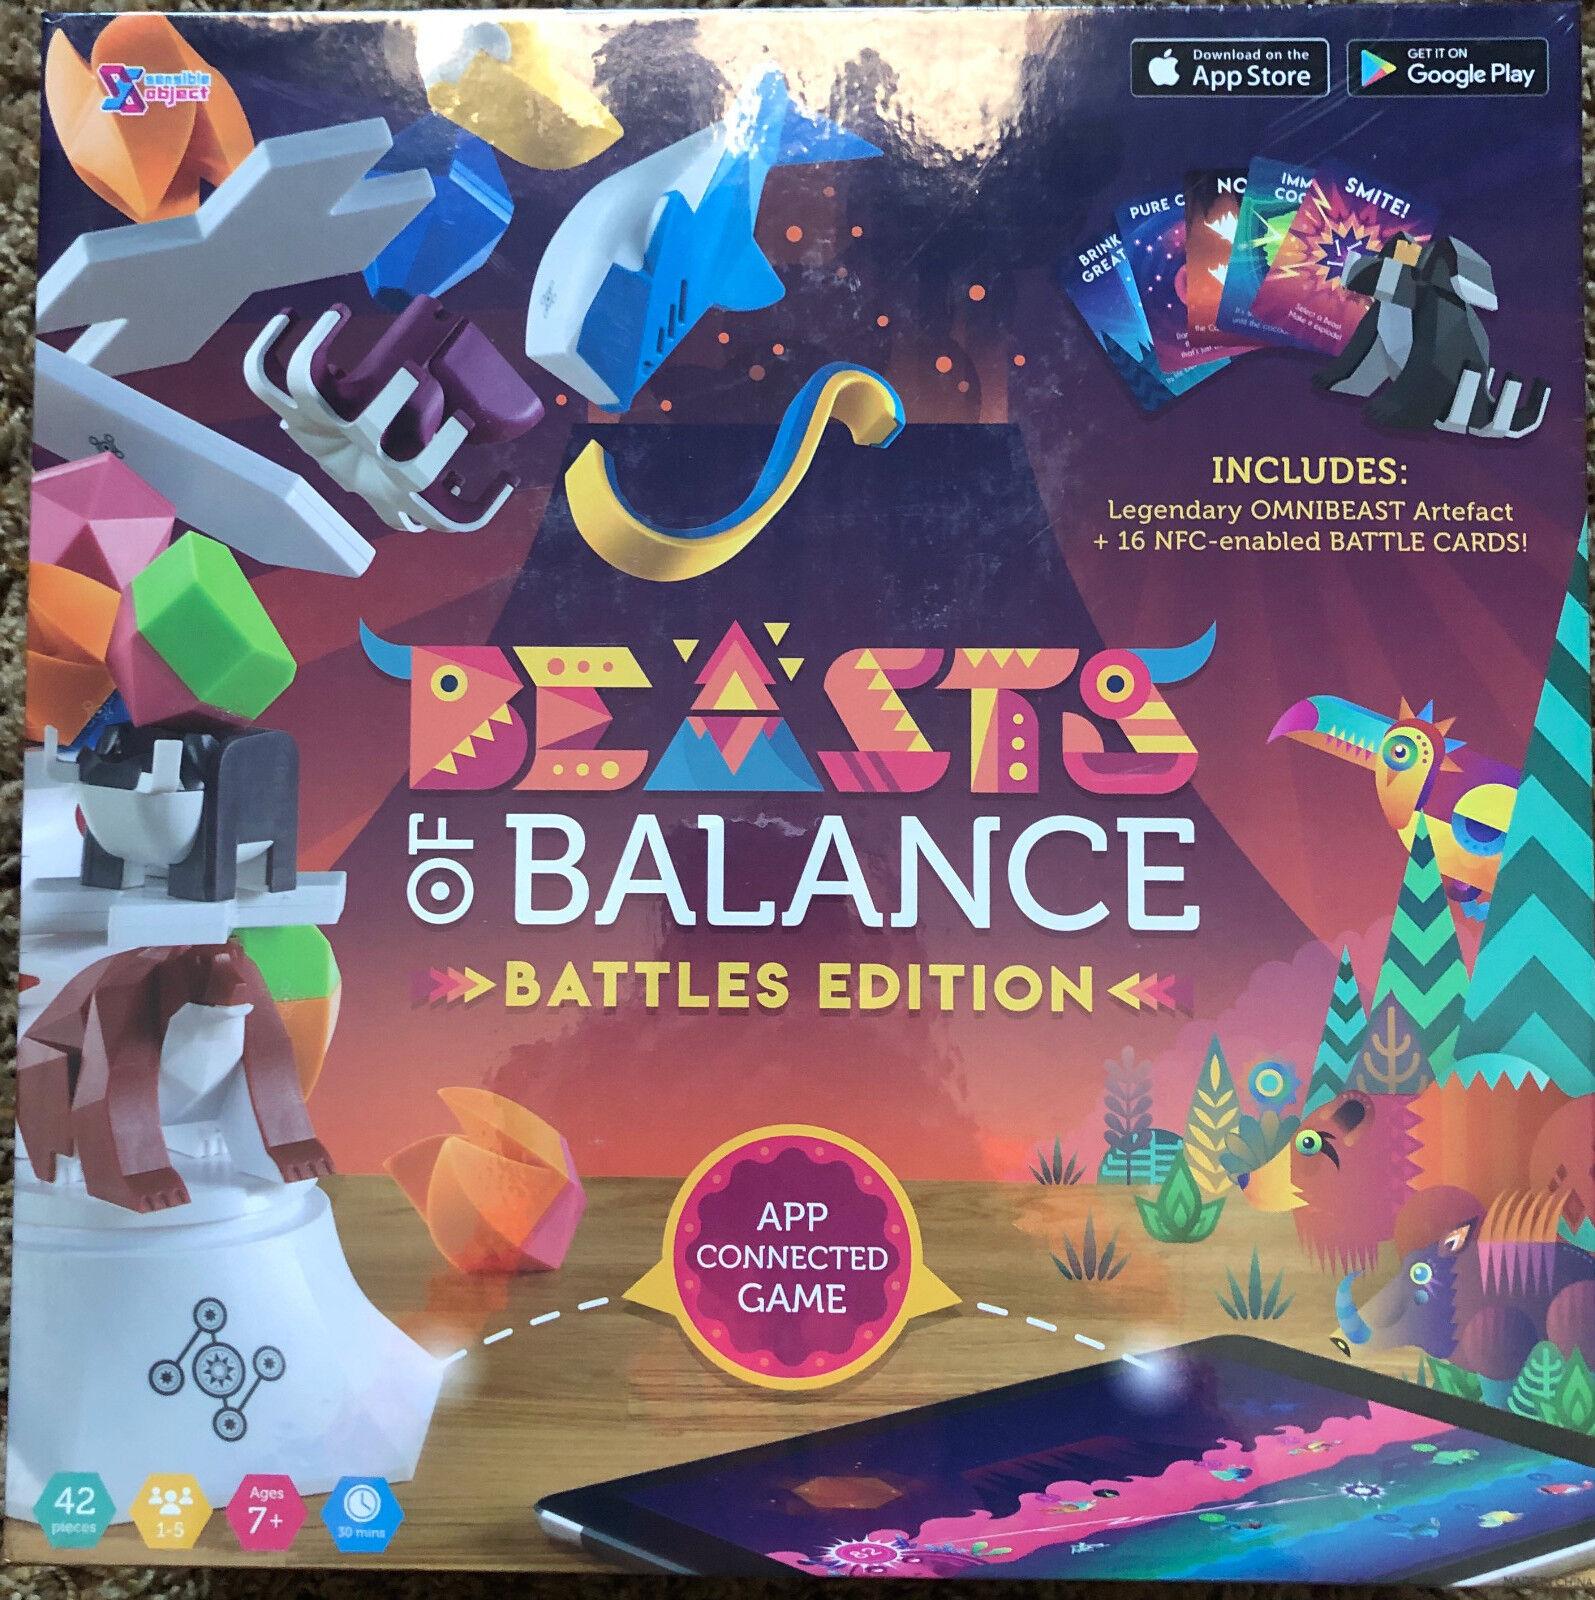 Beasts of Balance Battles Edition